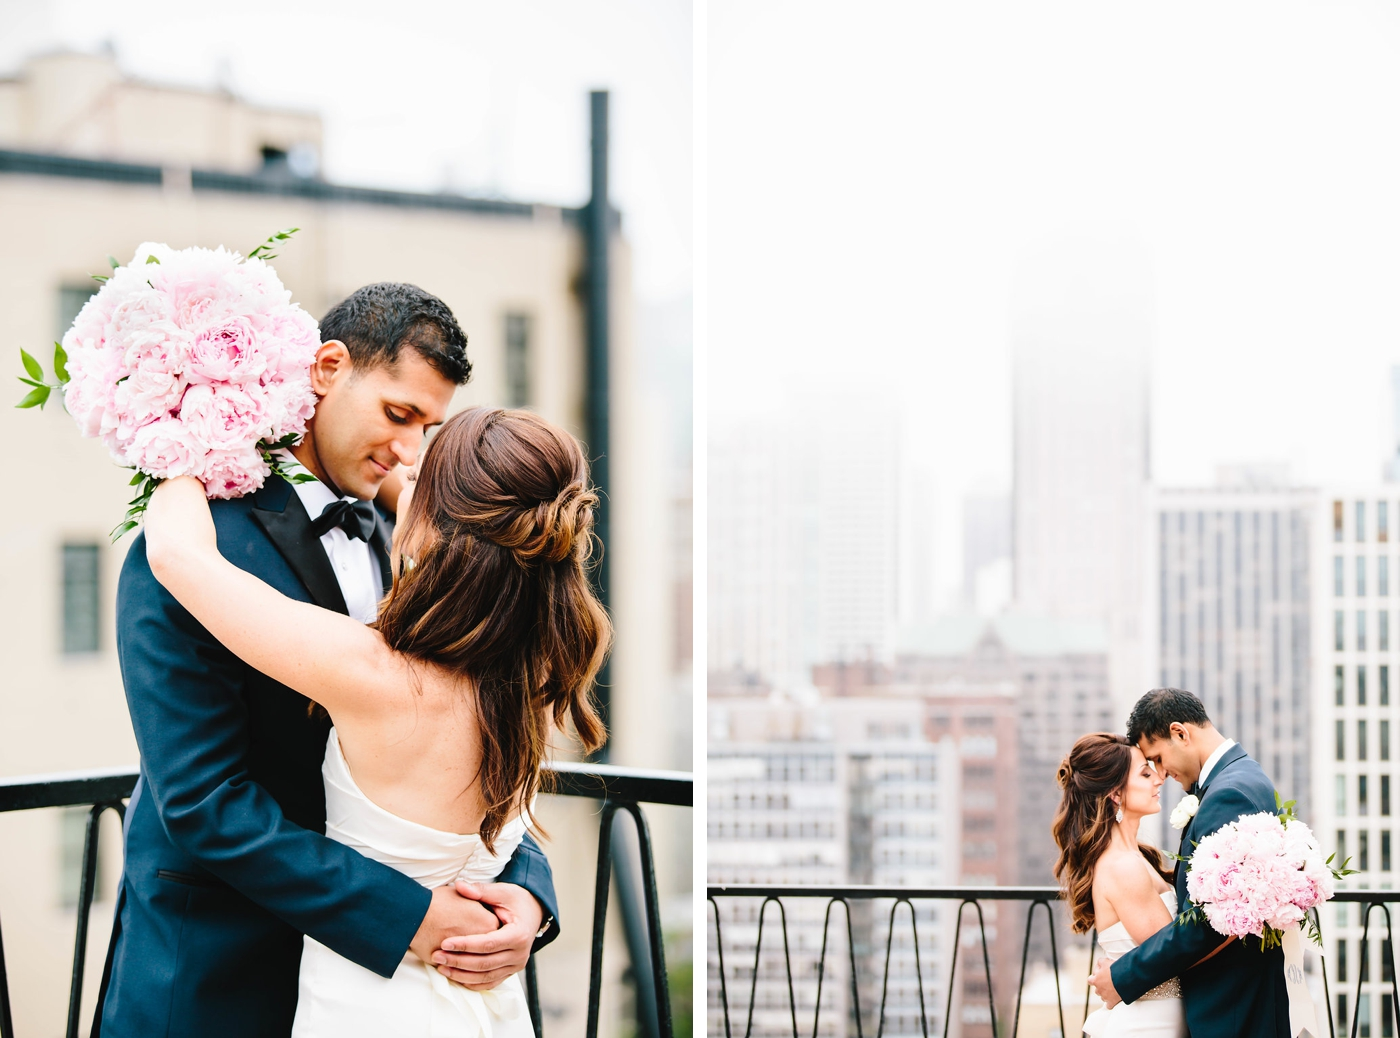 chicago-fine-art-wedding-photography-sakamuri21